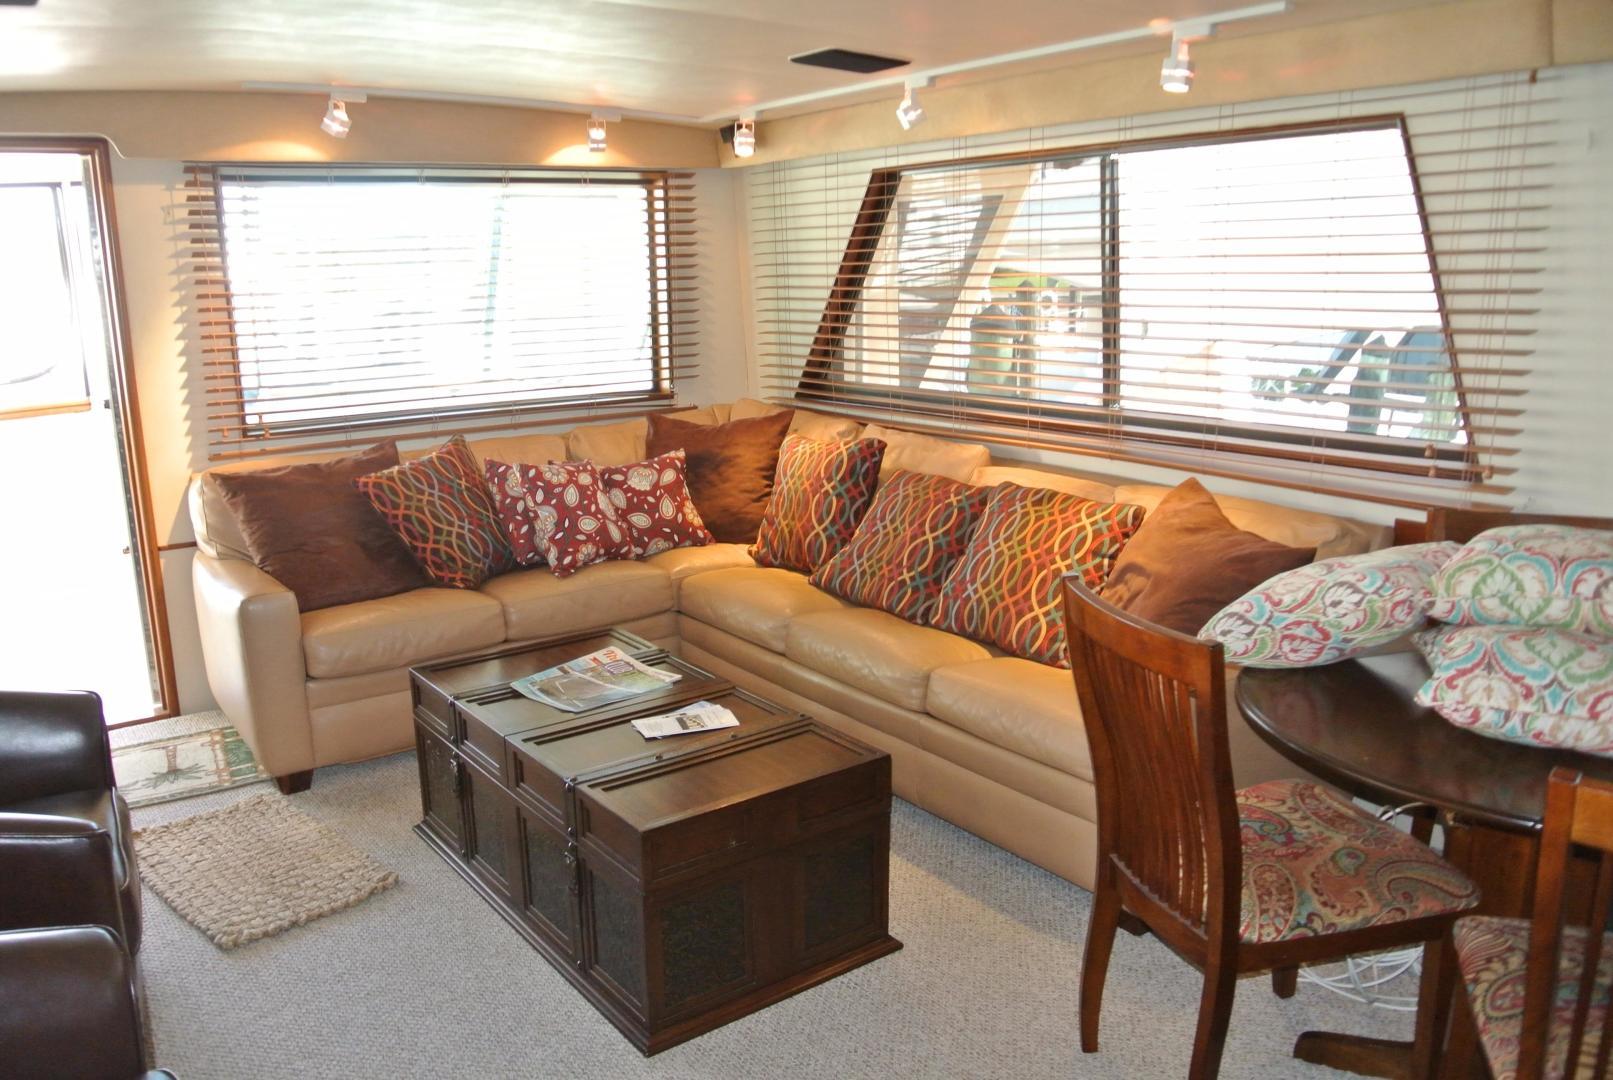 Hatteras-67-Cockpit-Motor-Yacht-1988-Lady-Encore-Saint-Petersburg-Florida-United-States-Salon-926190